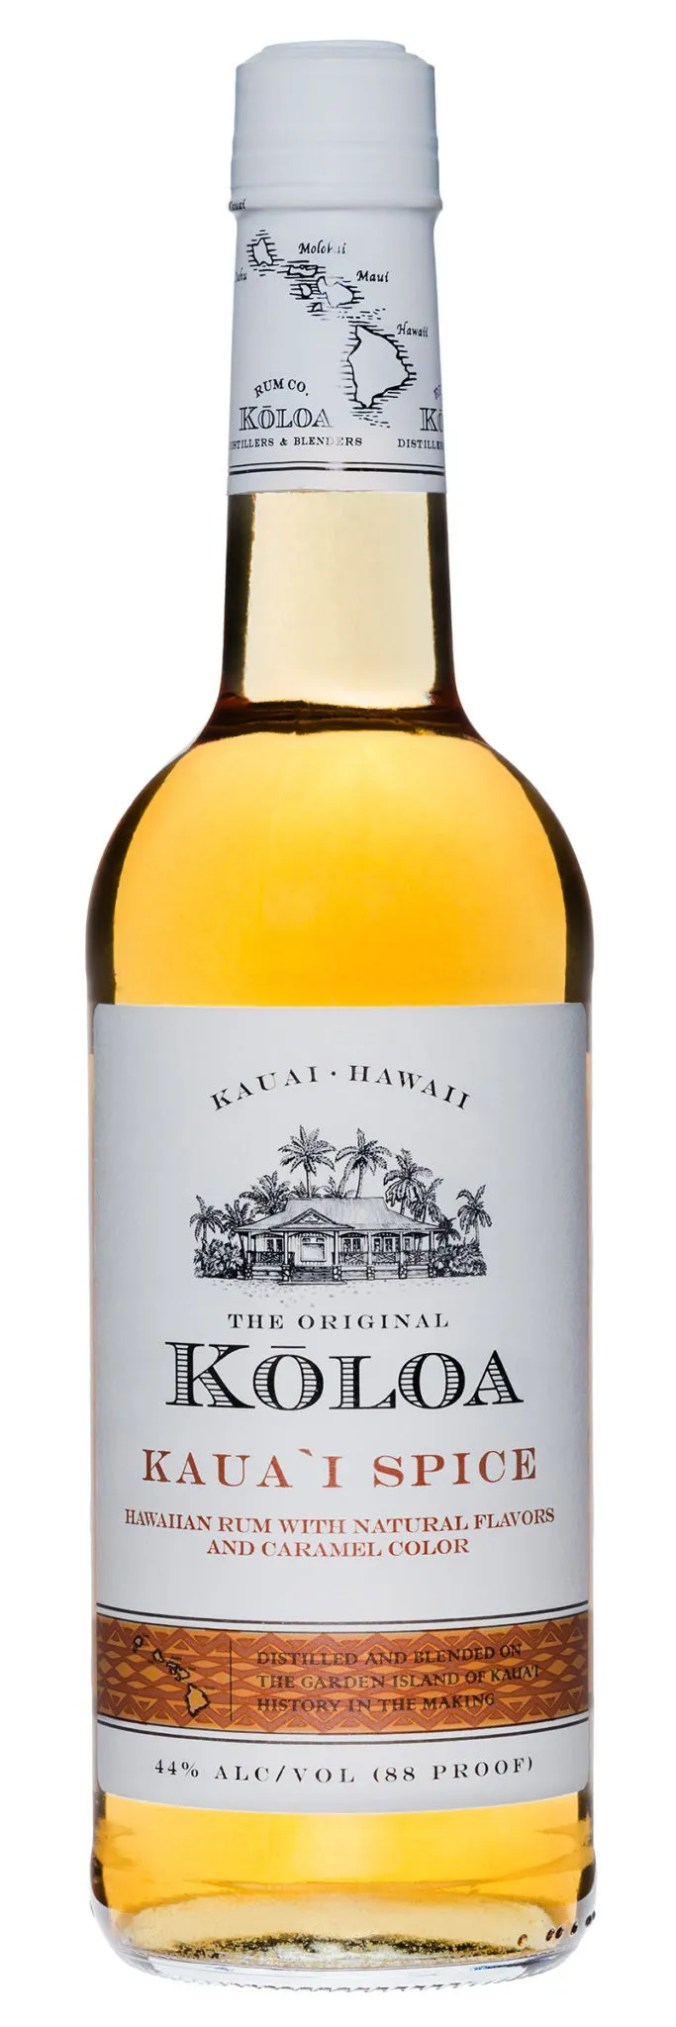 Koloa Kauai Spice Rum from Hawaii